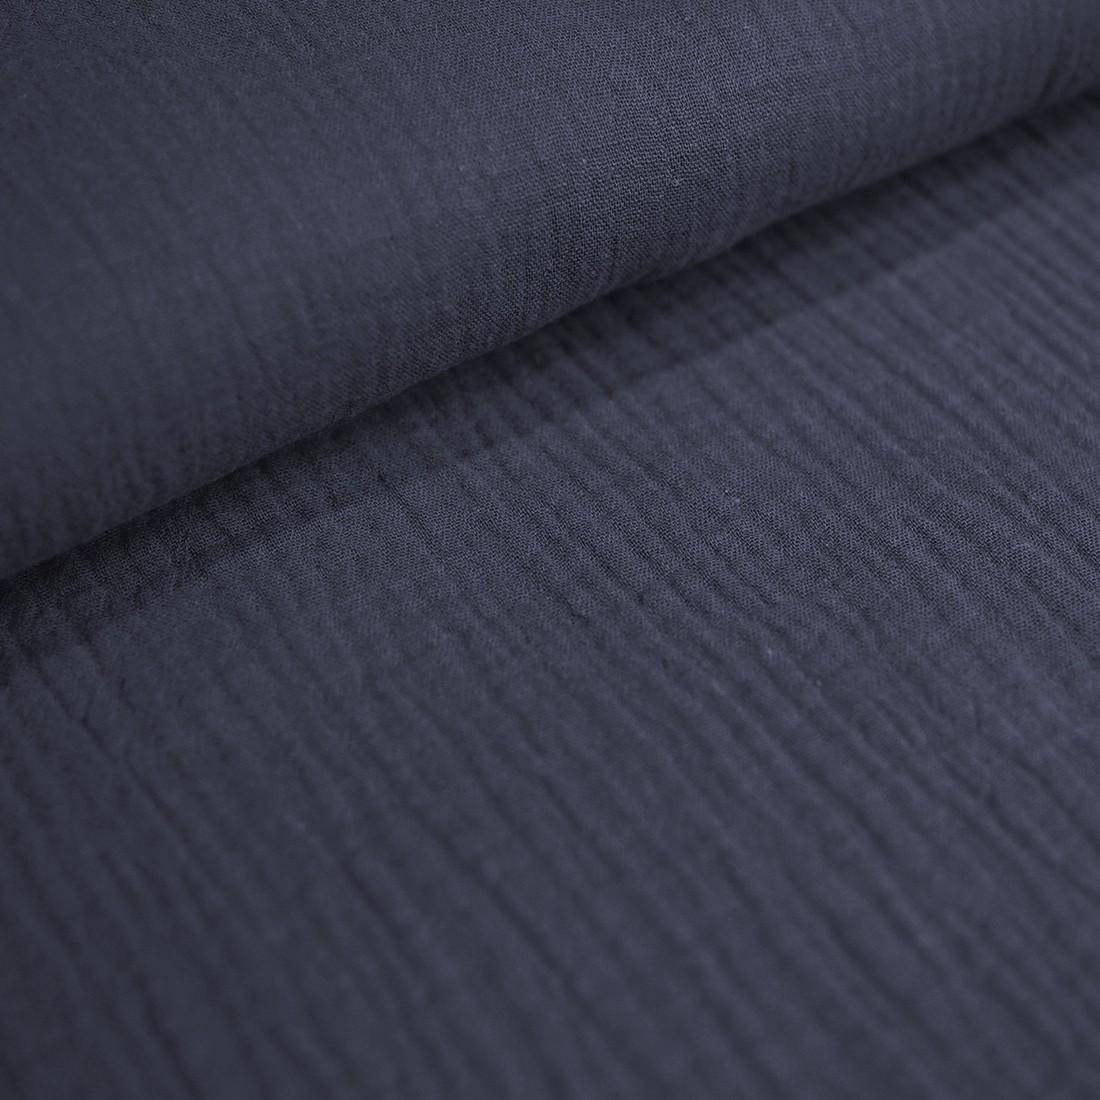 88 cm RESTSTÜCK-Baumwolle Musselin - Jeansblau-